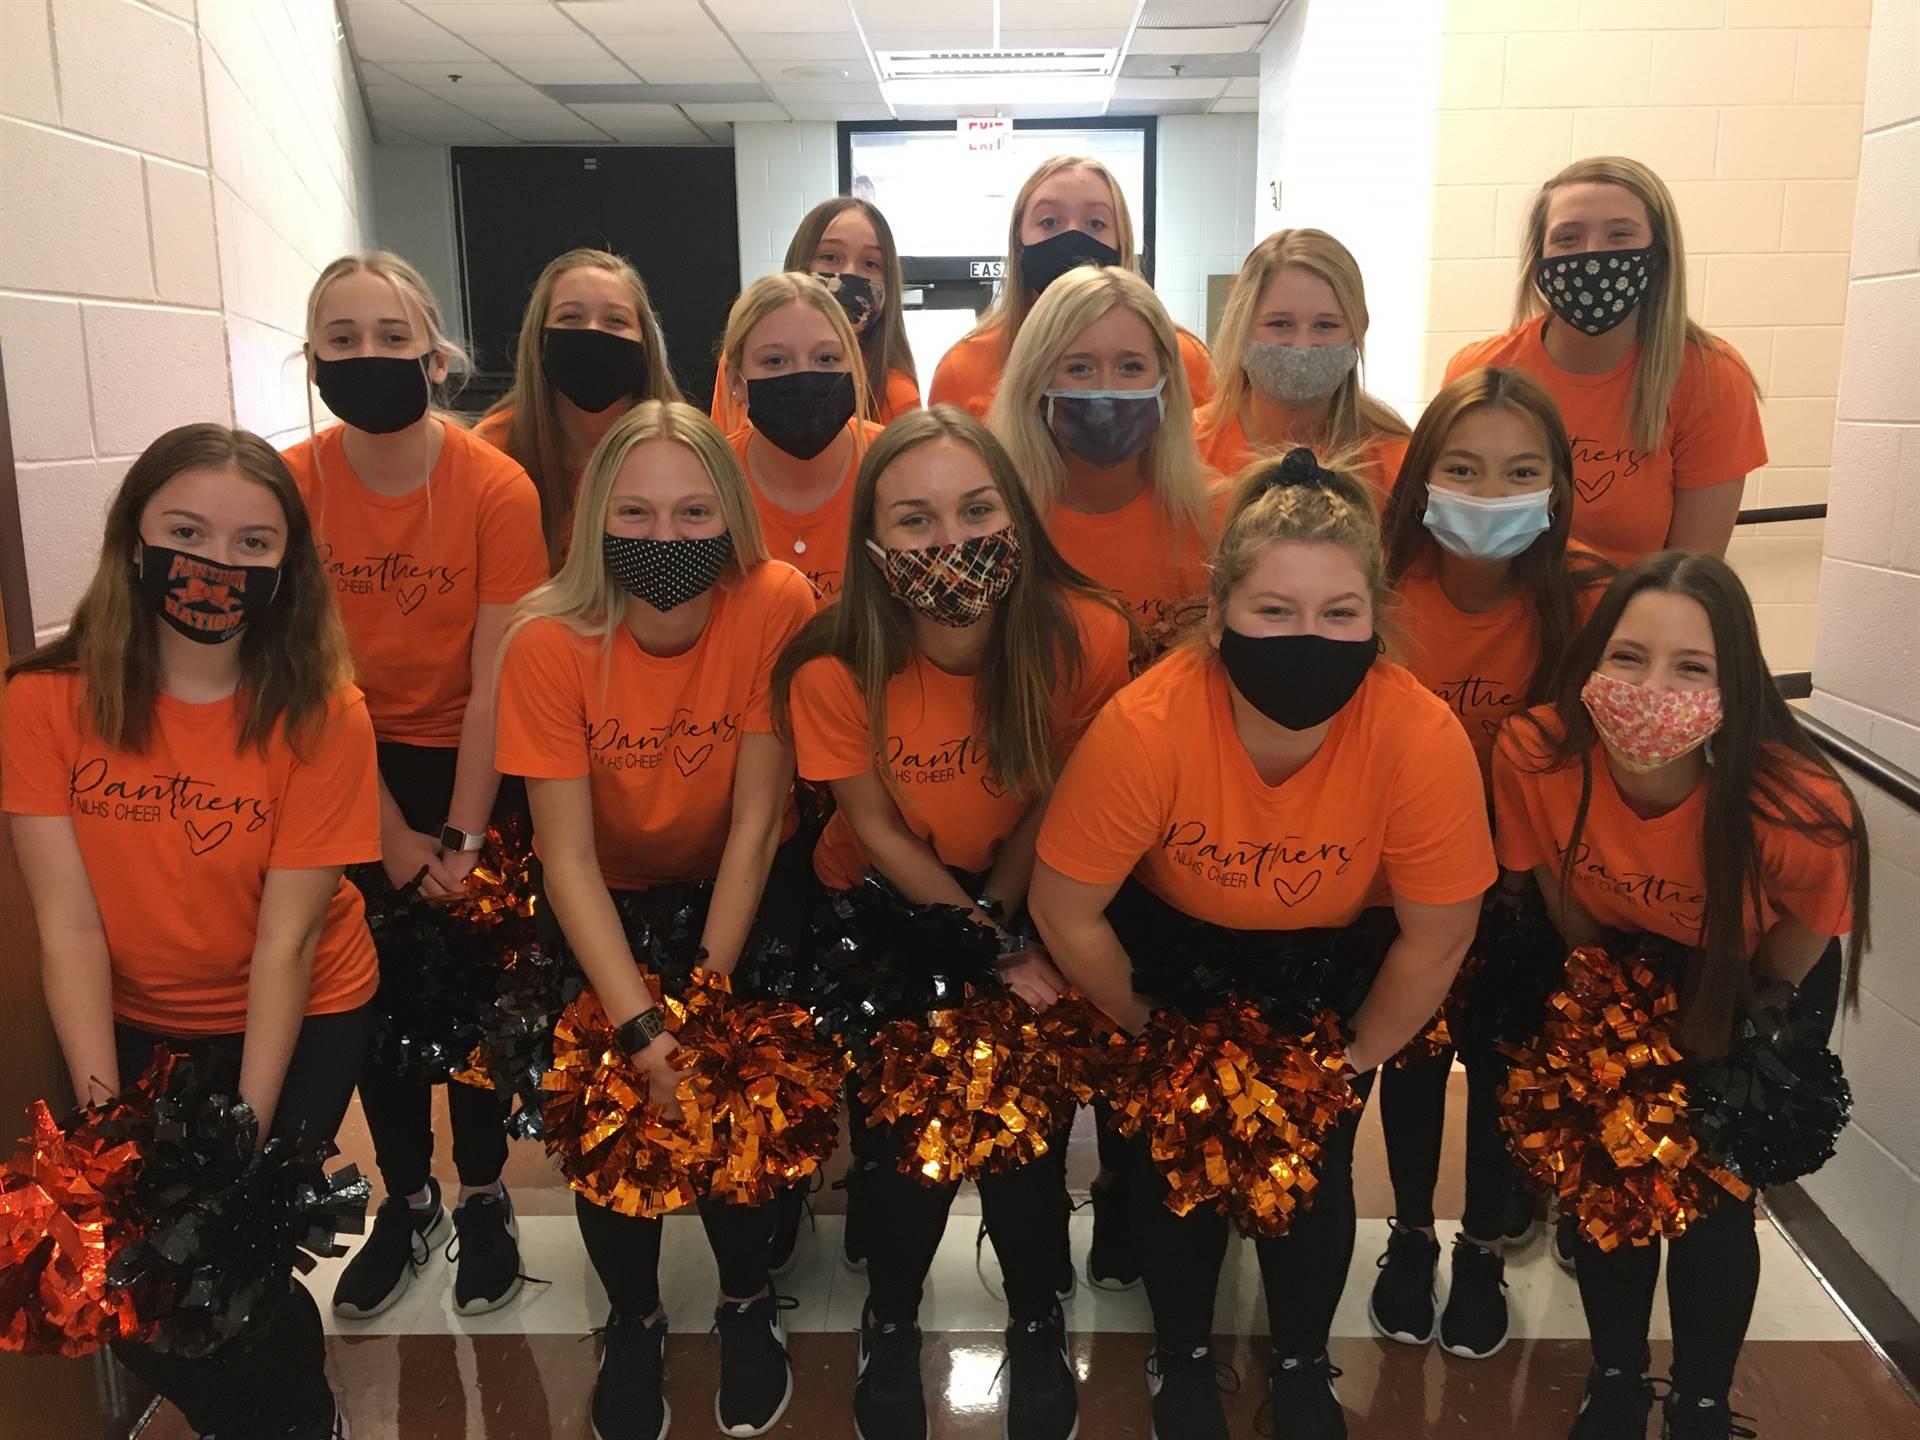 Cheerleaders during hallway pep rally